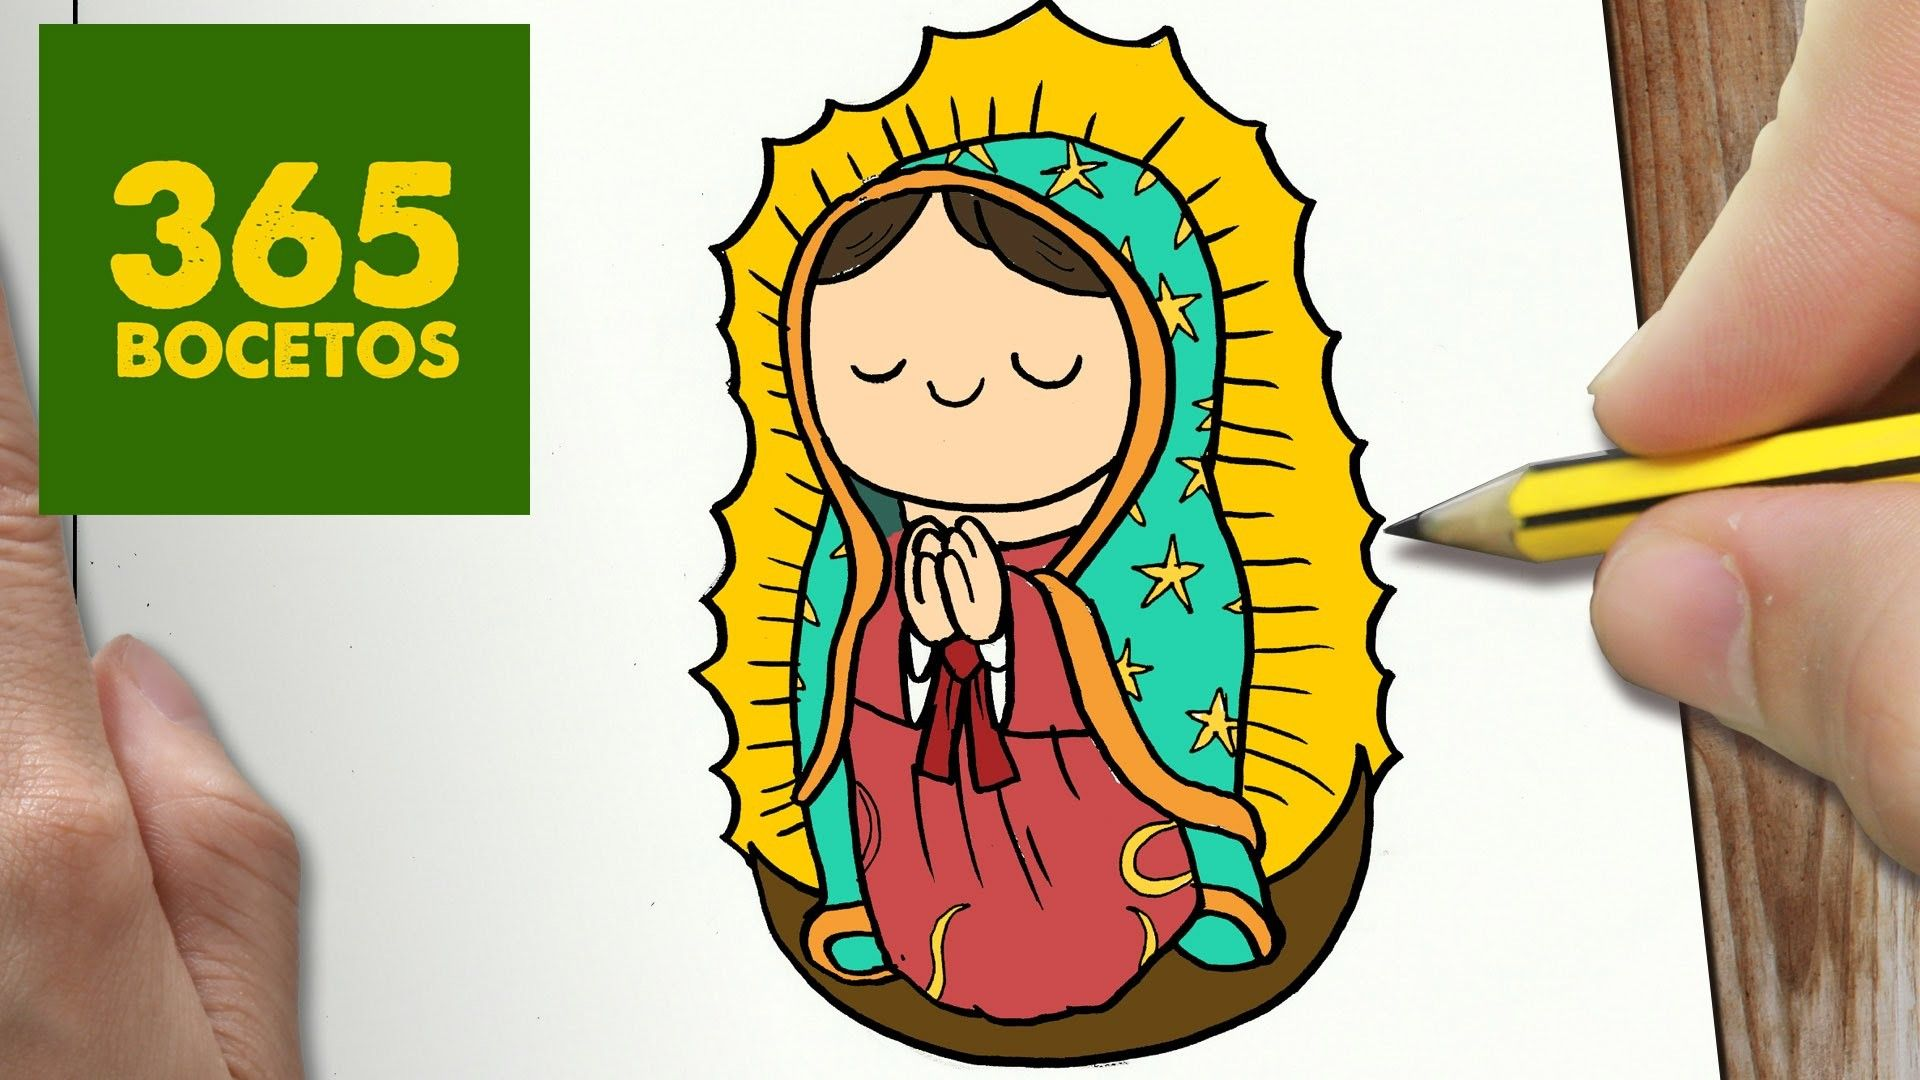 San Antonio En Dibujos Animados: COMO DIBUJAR VIRGEN DE GUADALUPE KAWAII PASO A PASO